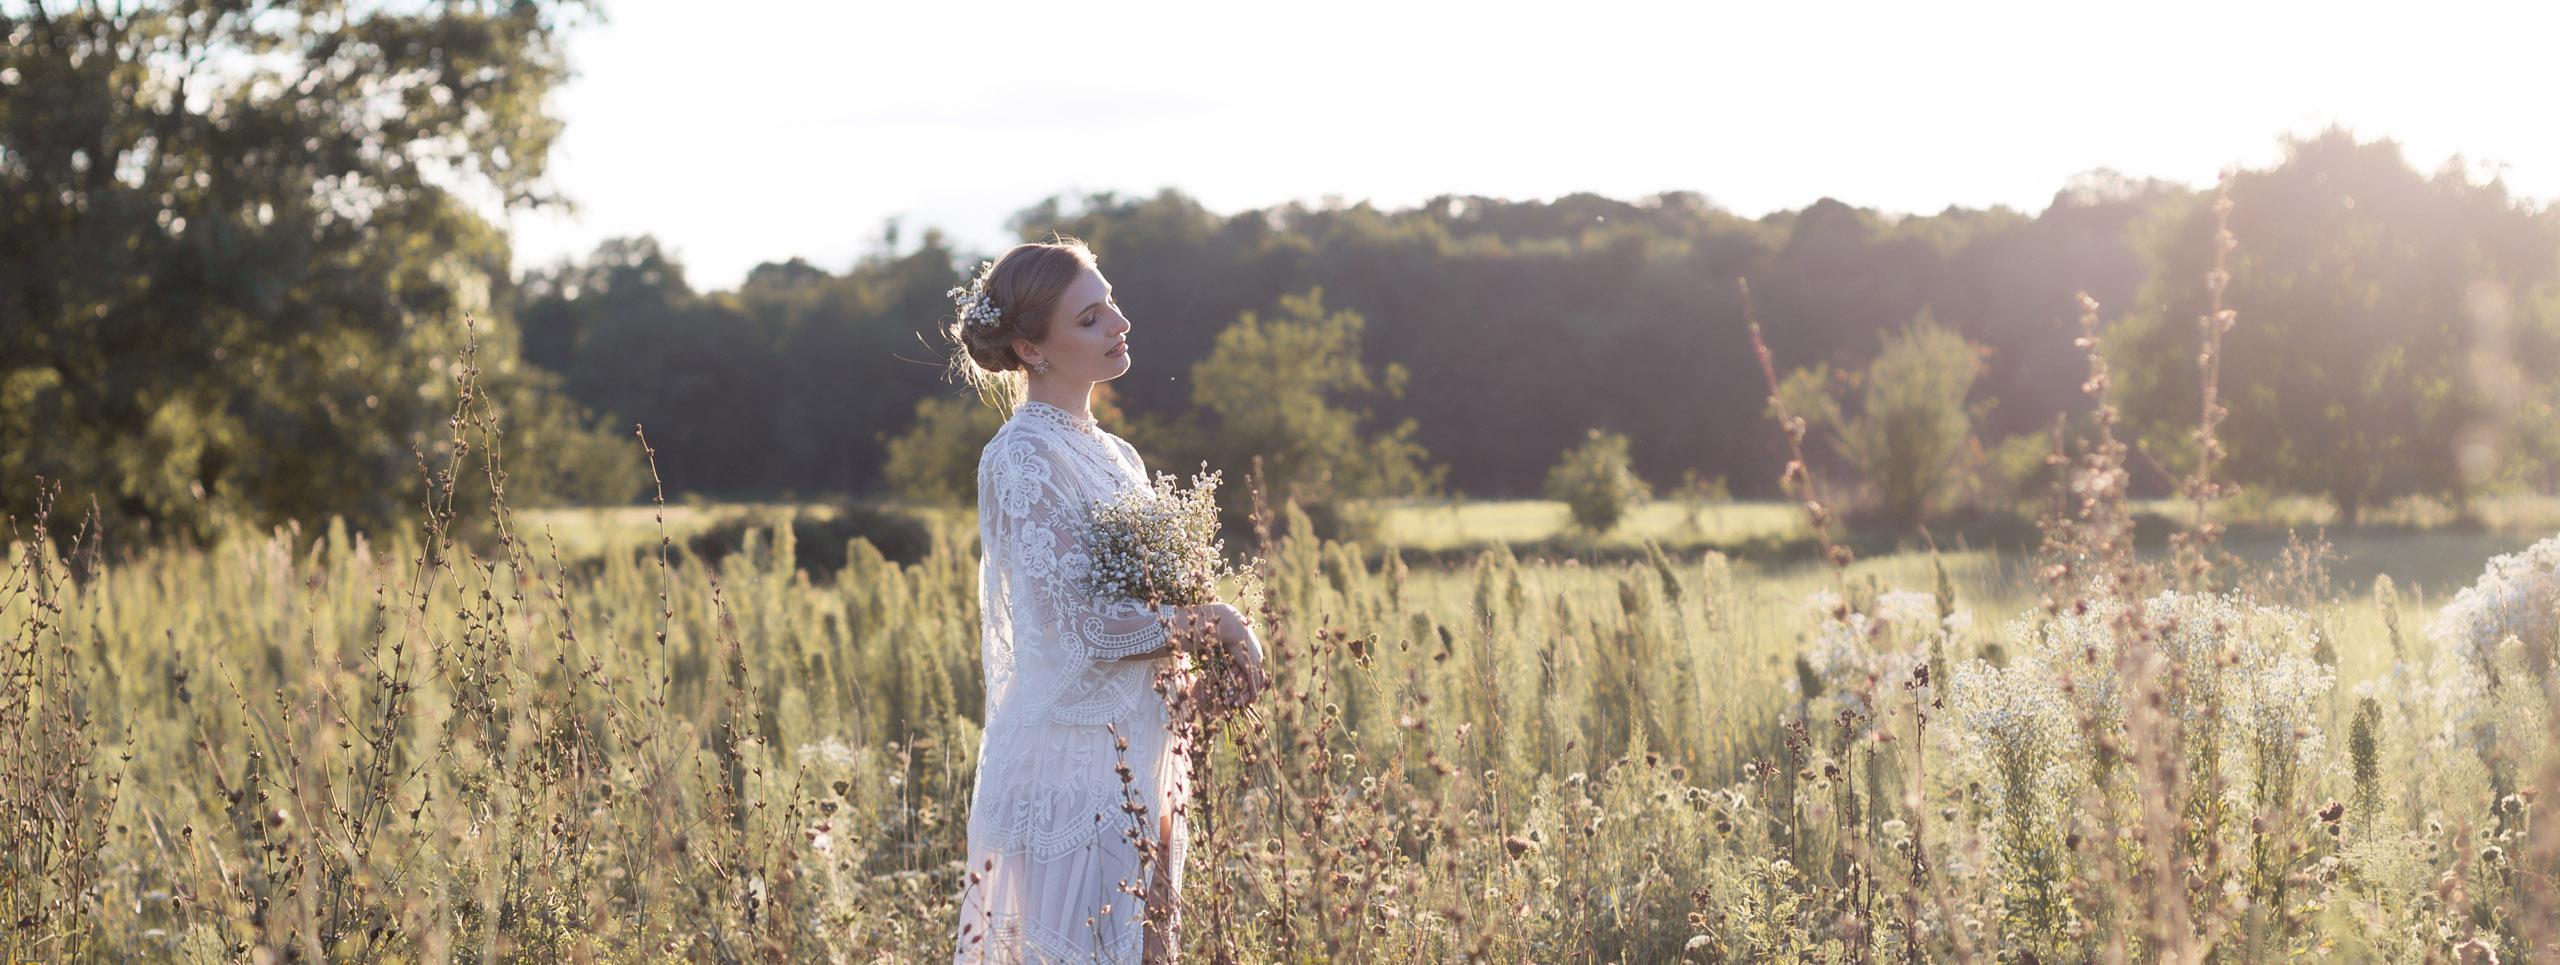 Braut Fotoshooting Hochzeitsfotograf Basel Nicole Kym - Nicole.Gallery